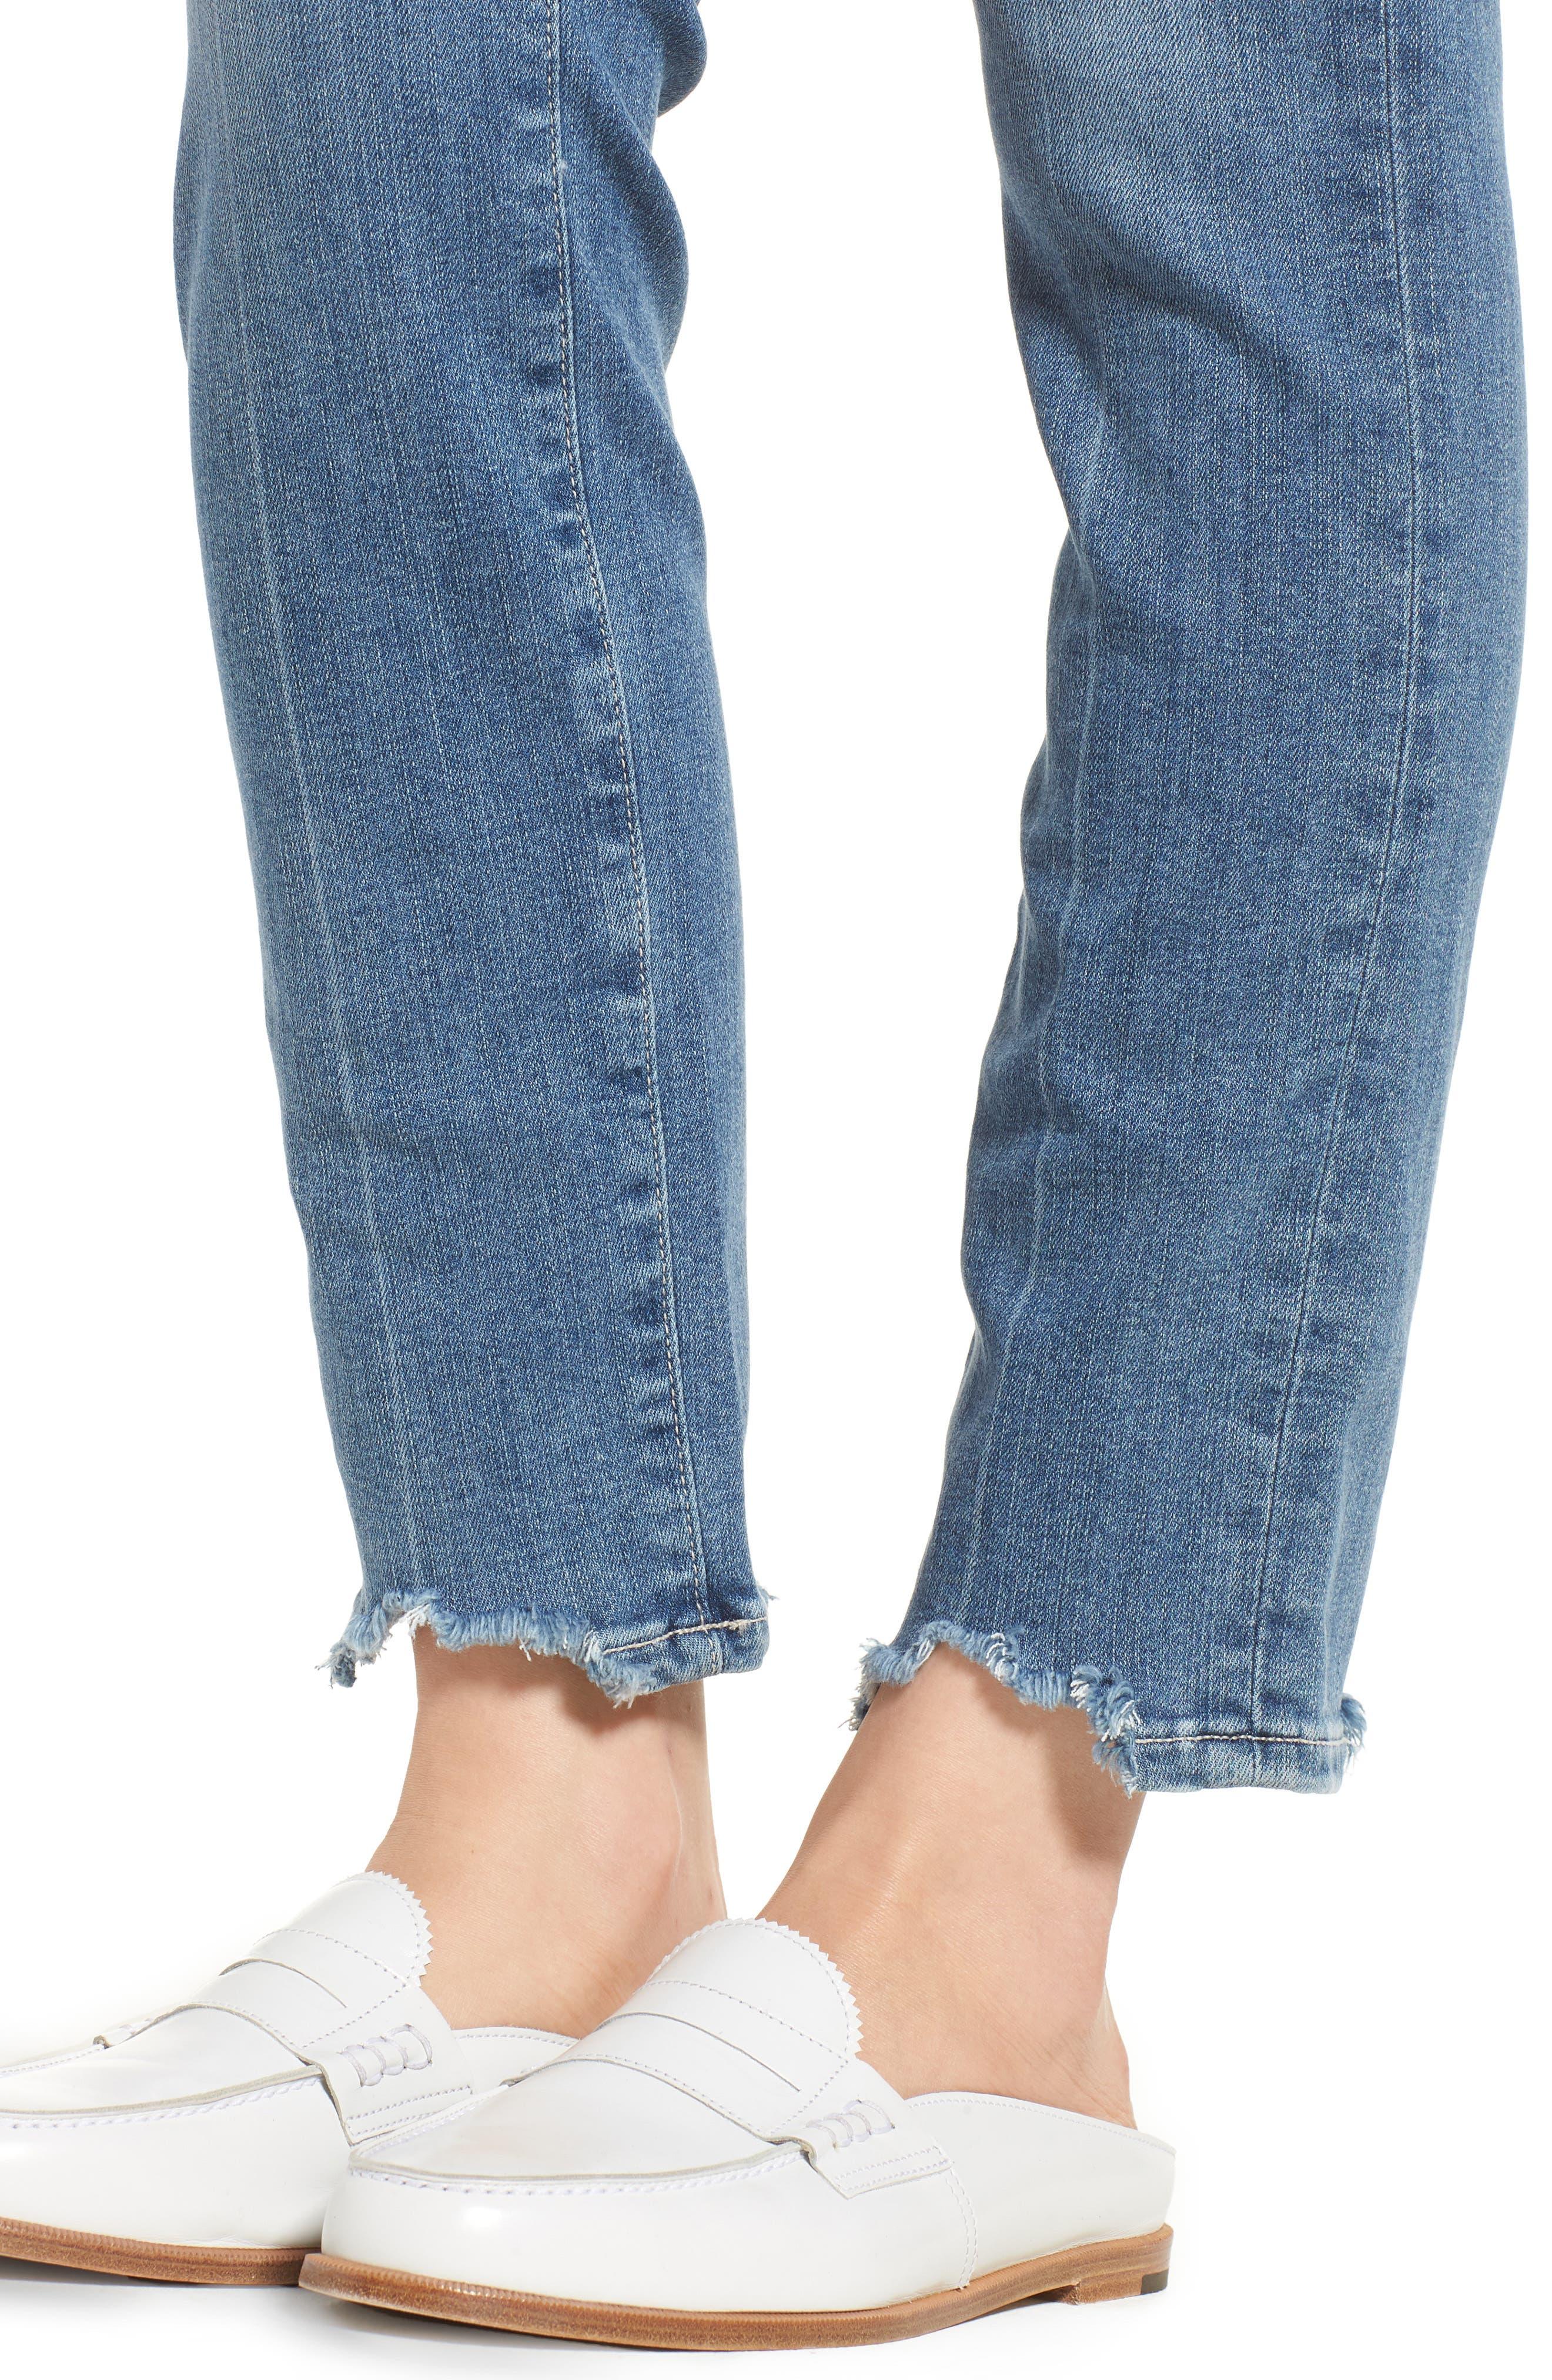 Transcend Vintage - Hoxton High Waist Ankle Skinny Jeans,                             Alternate thumbnail 4, color,                             ZAHARA